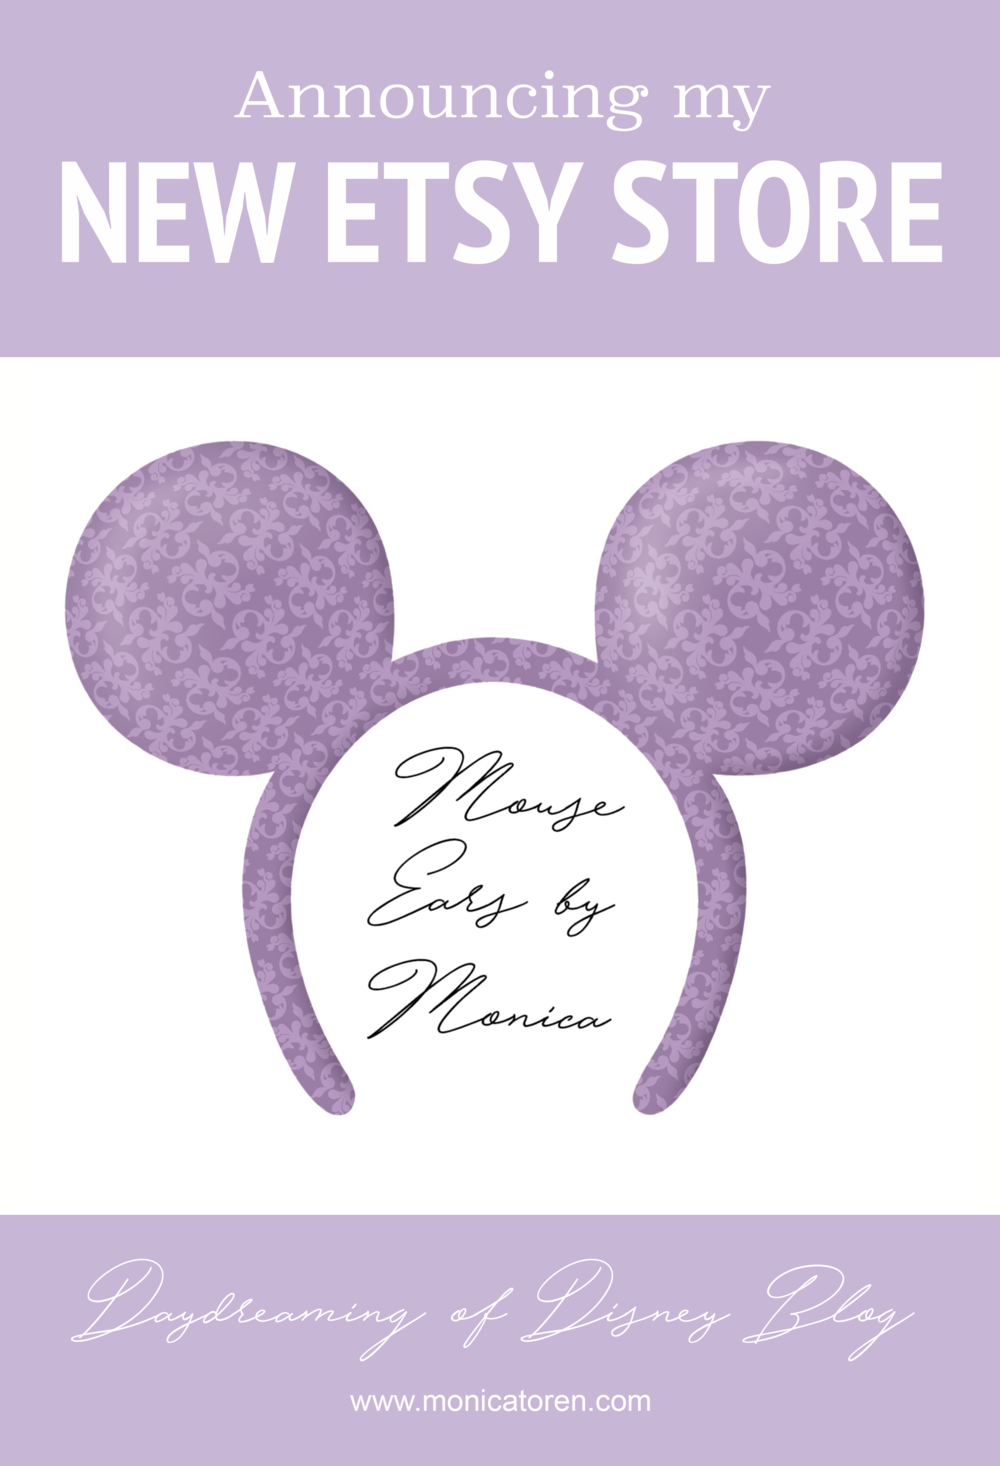 Daydreaming of Disney Blog - Announcing my New Etsy Store - http://www.monicatoren.com #disney #etsy #etsyshop #newetsyshop